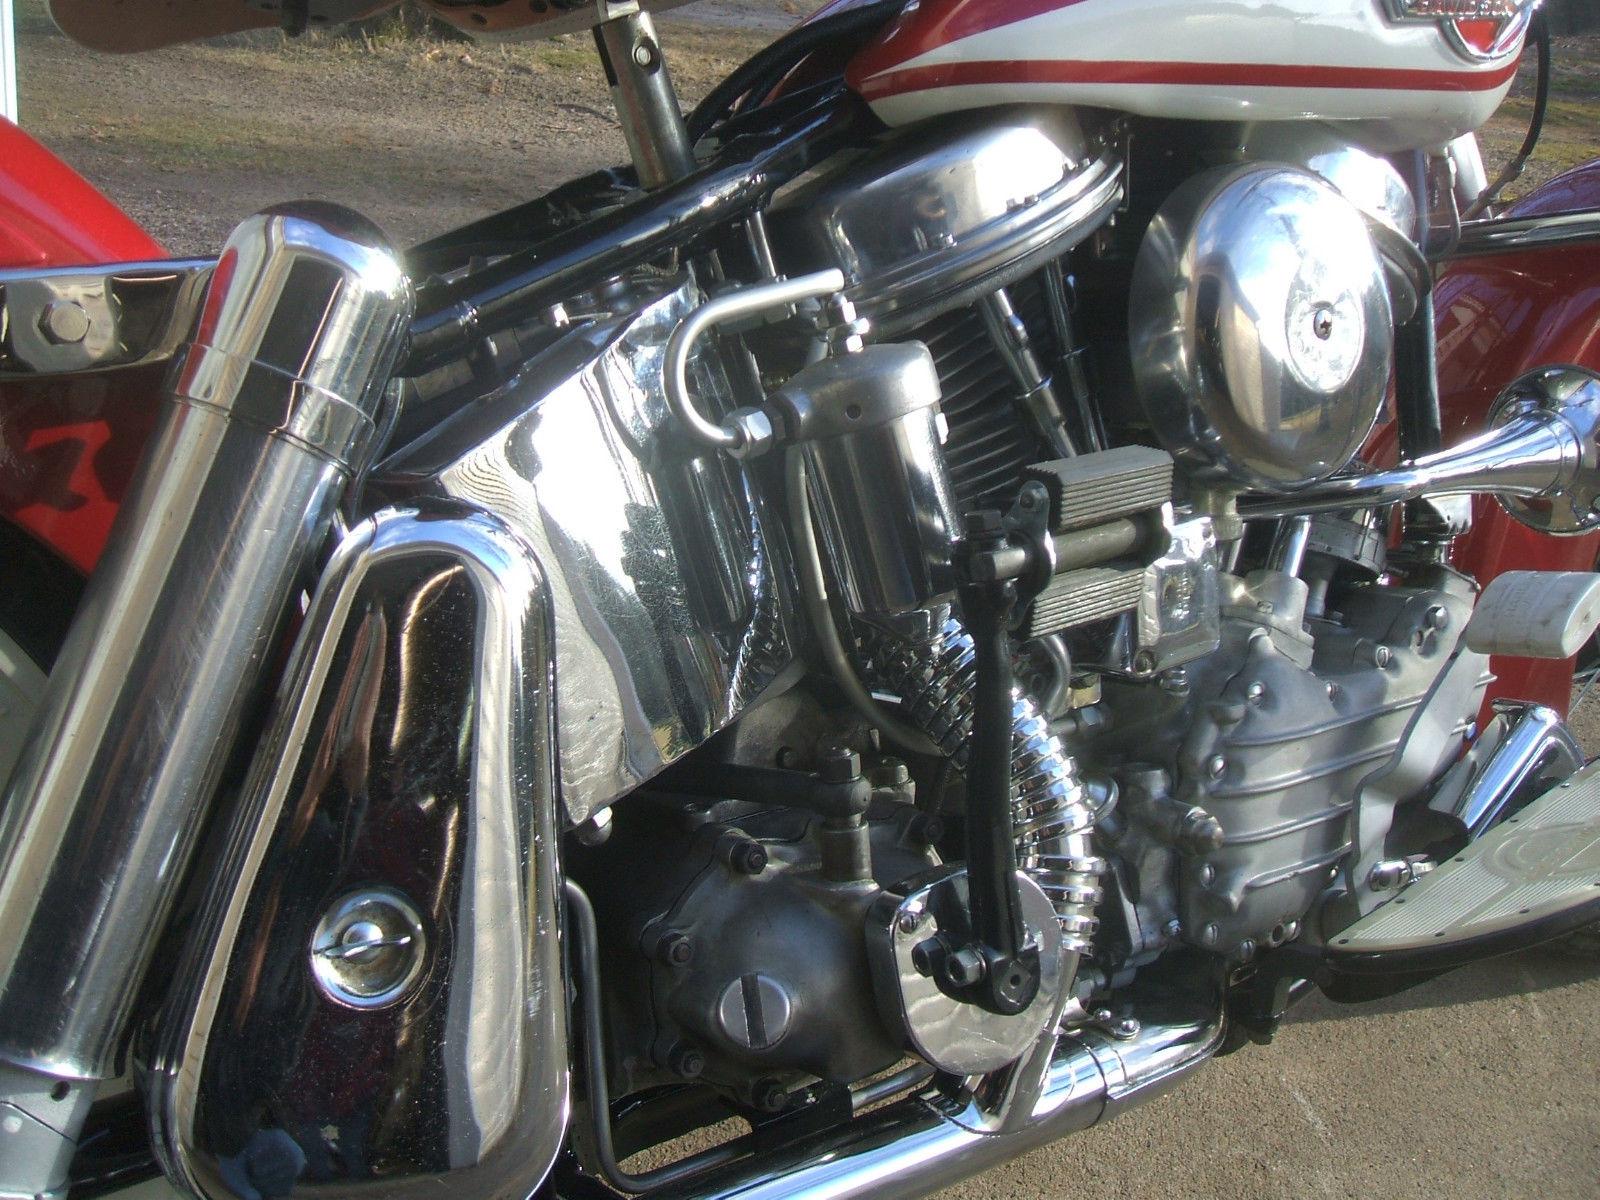 Harley-Davidson Panhead - 1960 - Oil Tank, Motor, Rear Shock and Air Filter.